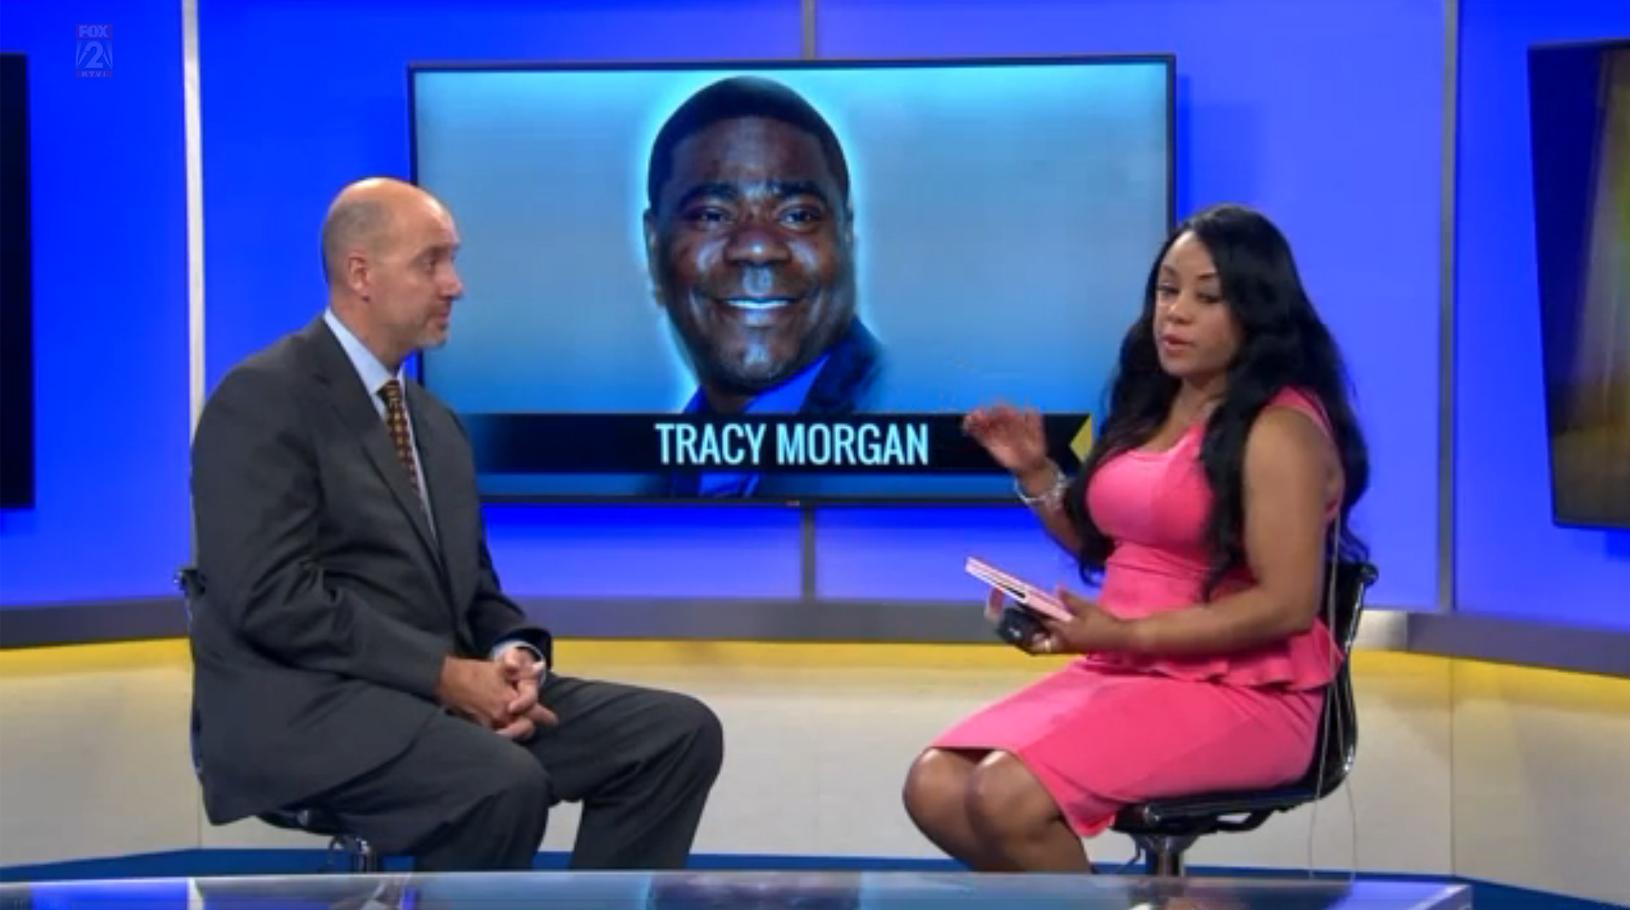 Tracy Morgan Truck Accident - KPLR 11